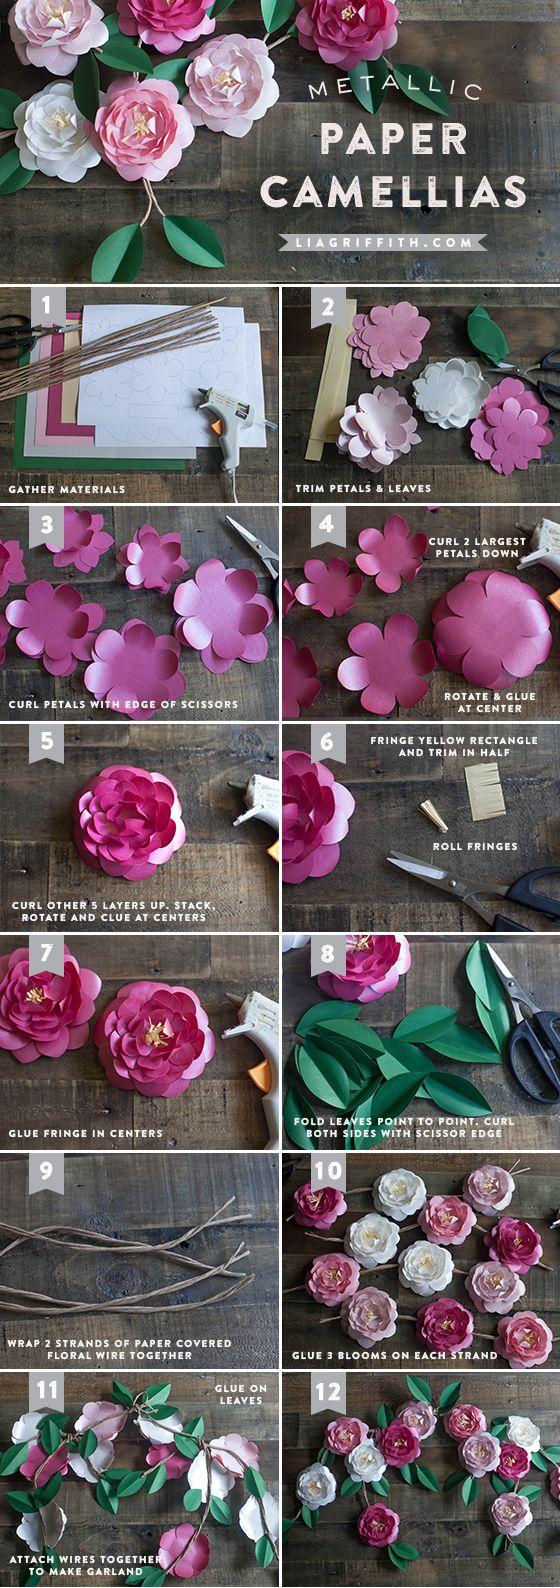 DIY Metallic Paper Camellias -   22 diy flower tutorial ideas